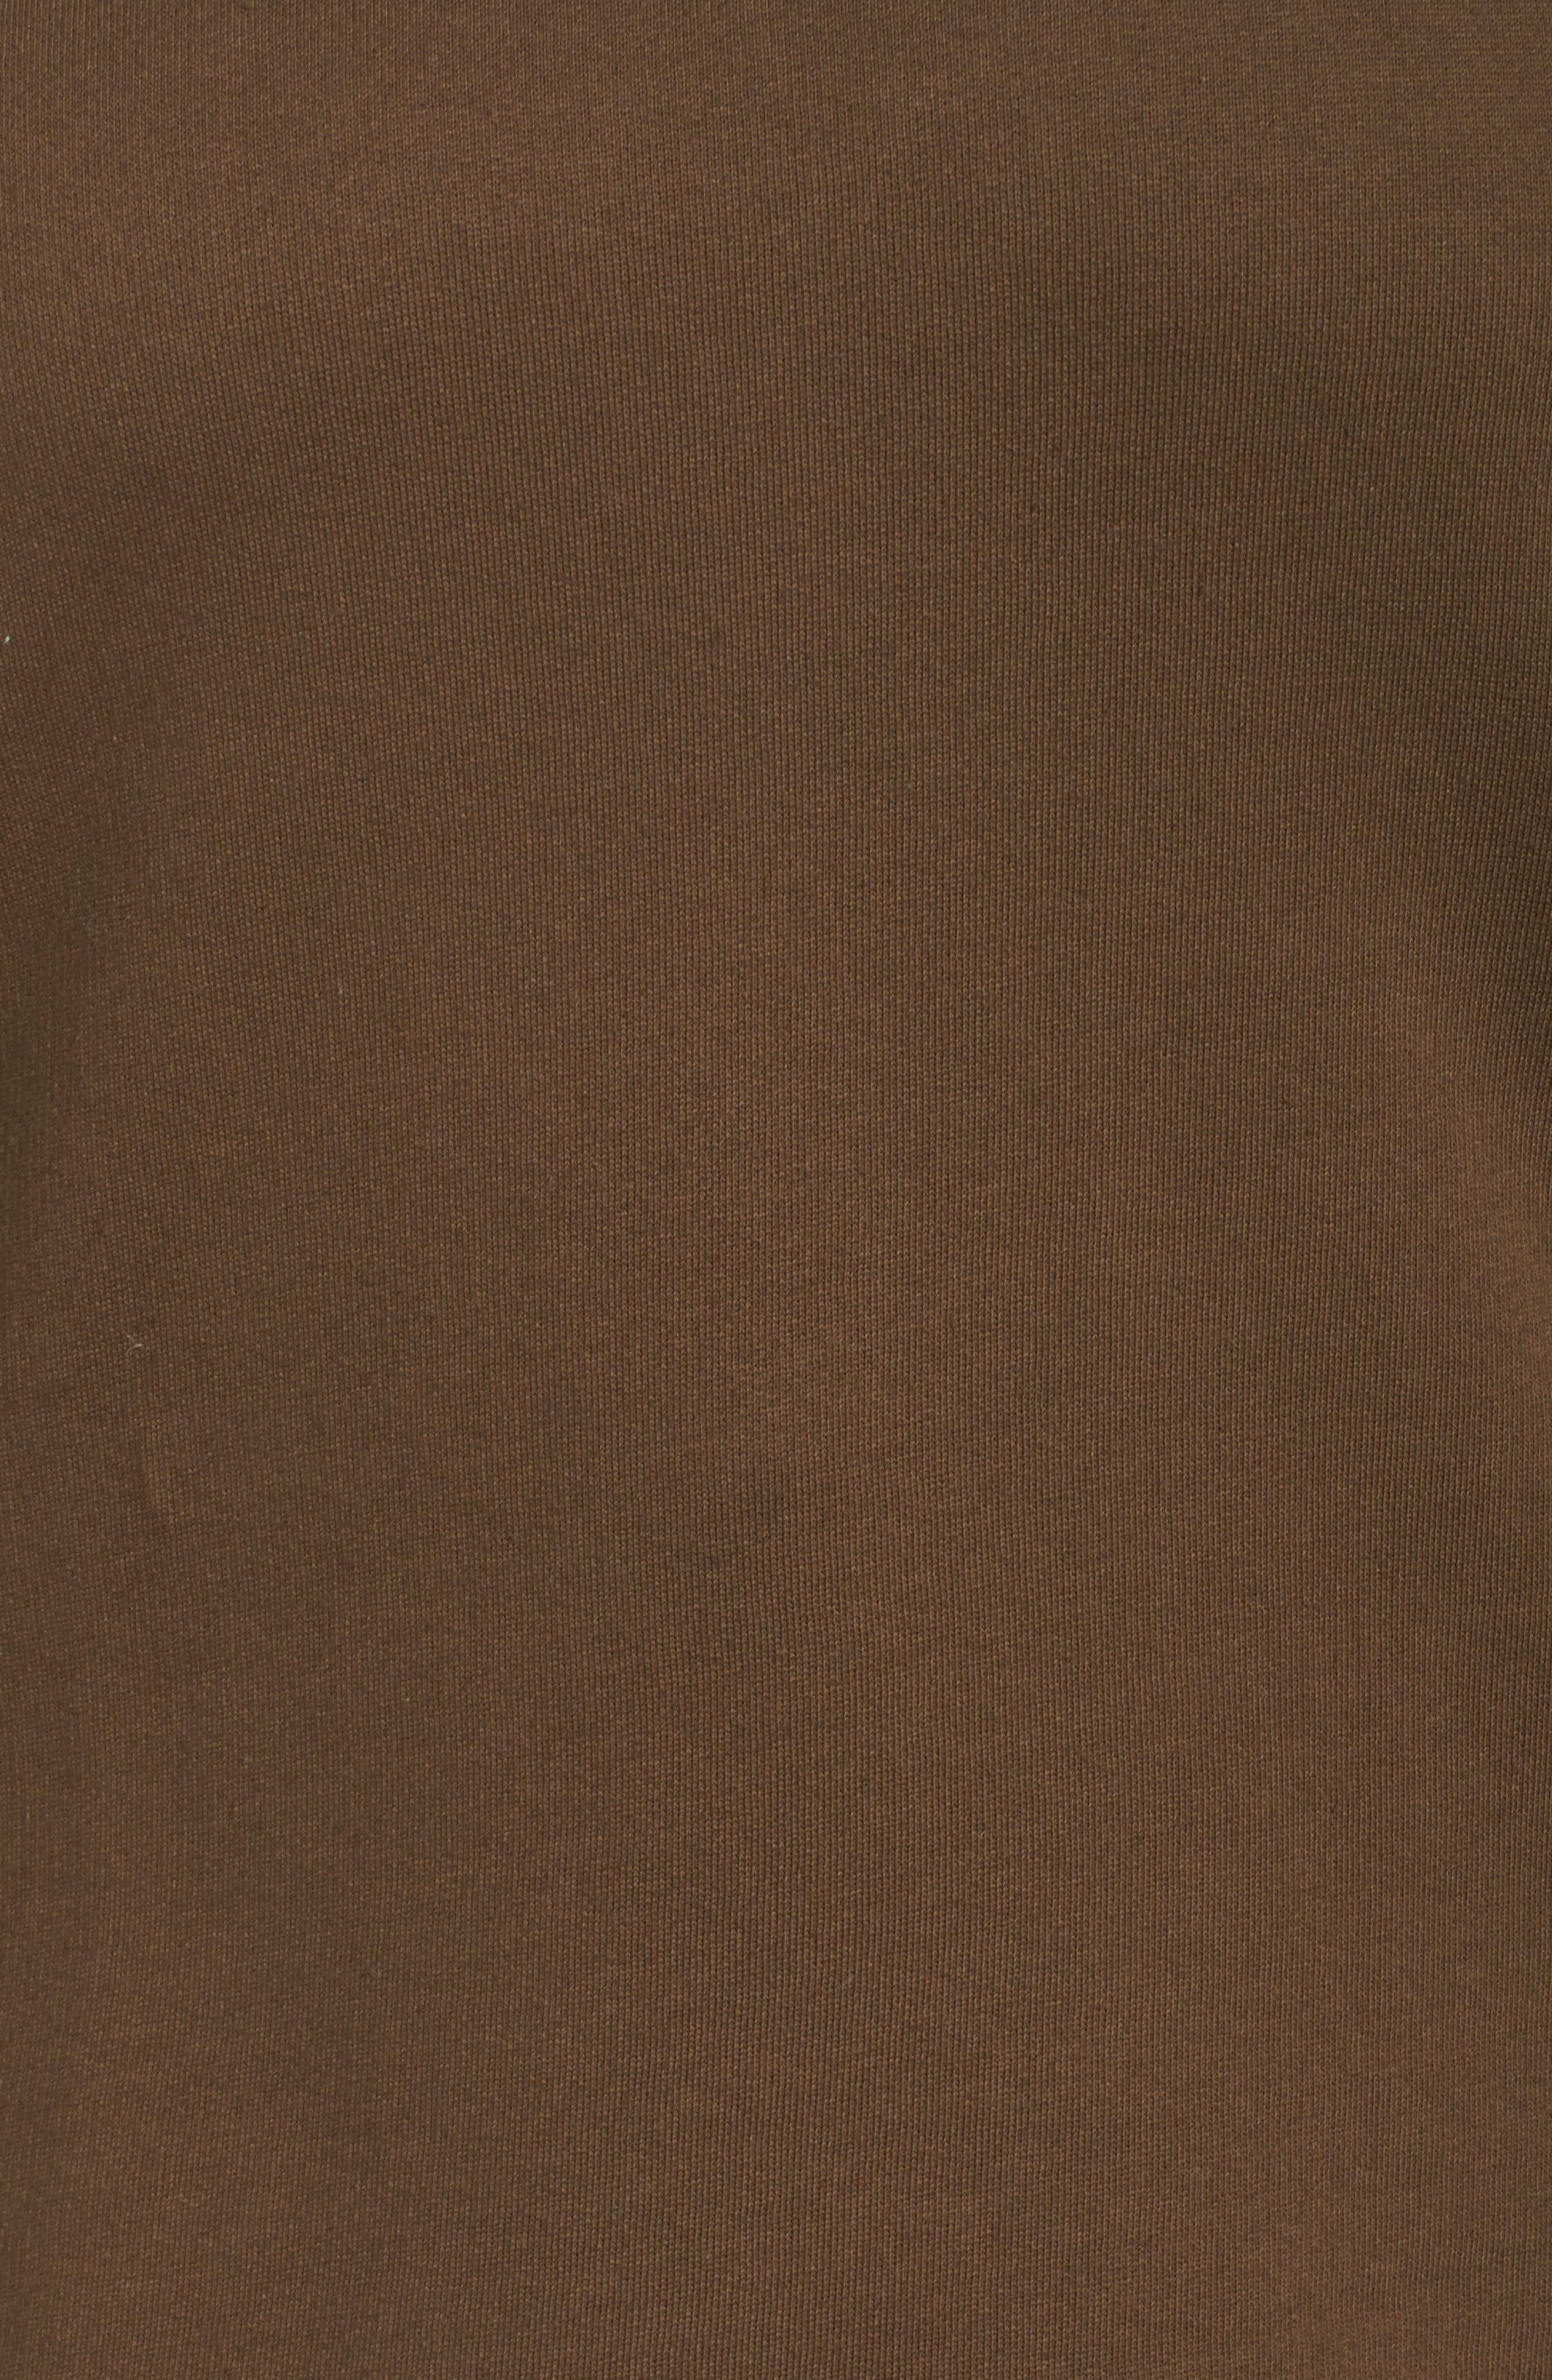 Ruffle Sleeve Sweatshirt,                             Alternate thumbnail 5, color,                             316